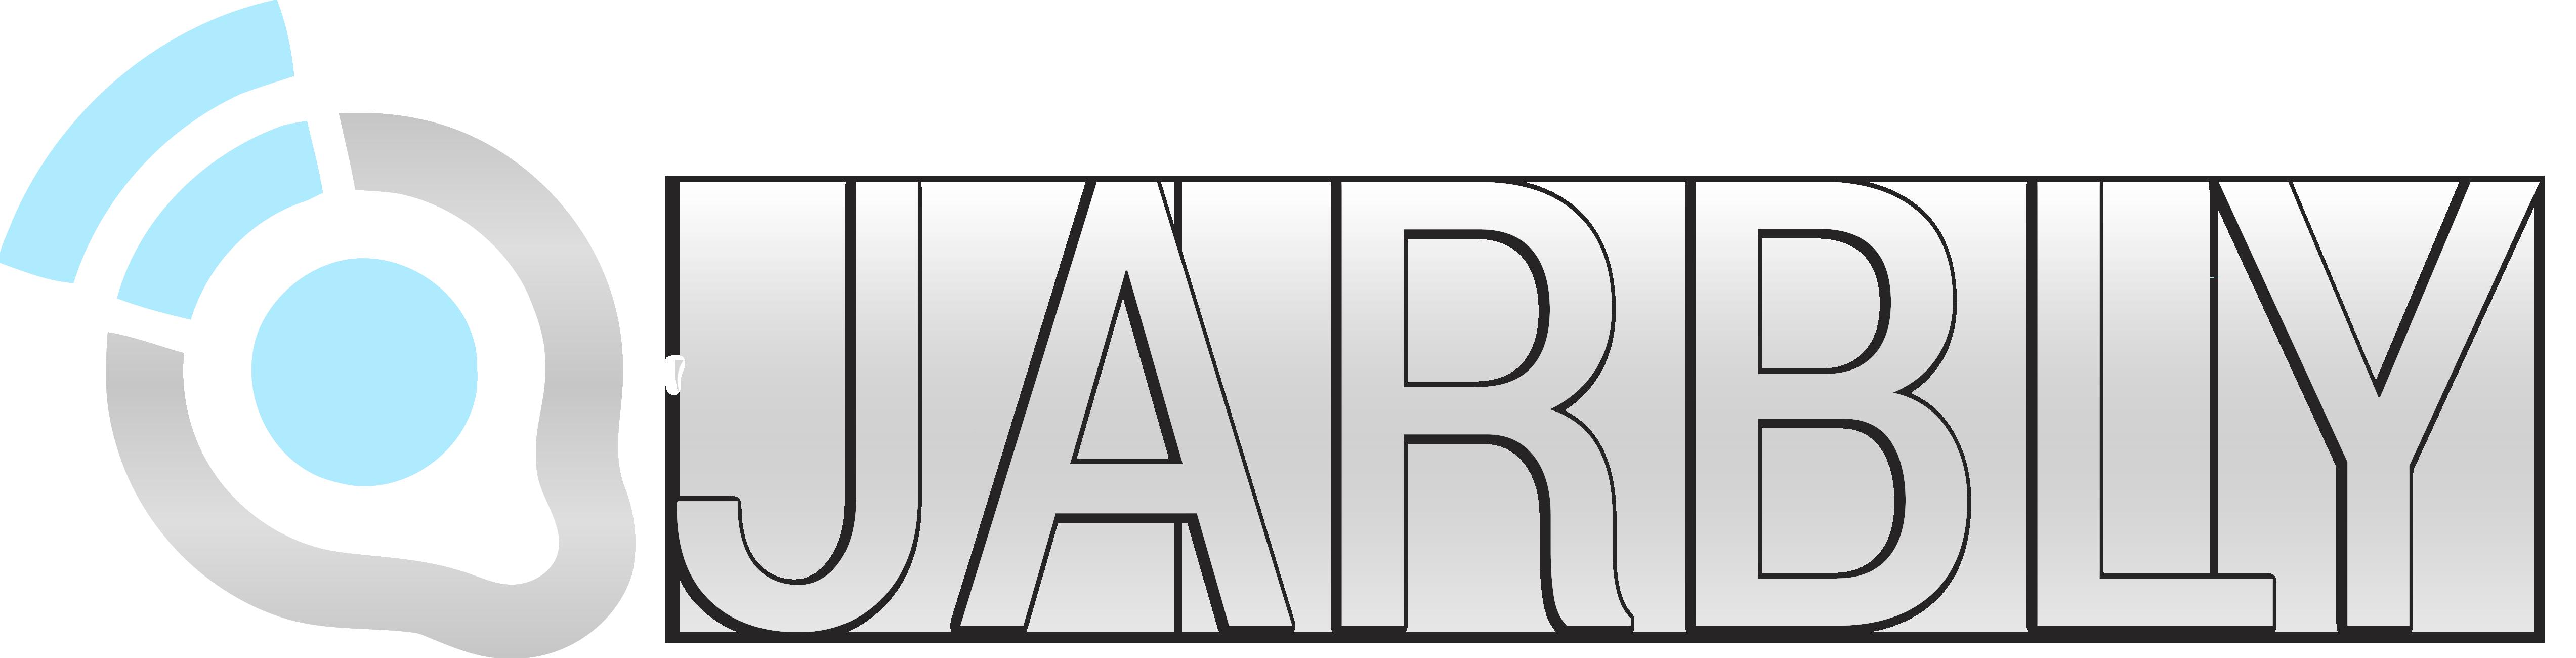 Jarbly - Web Development, Graphic Design & Marketing Consulting Company